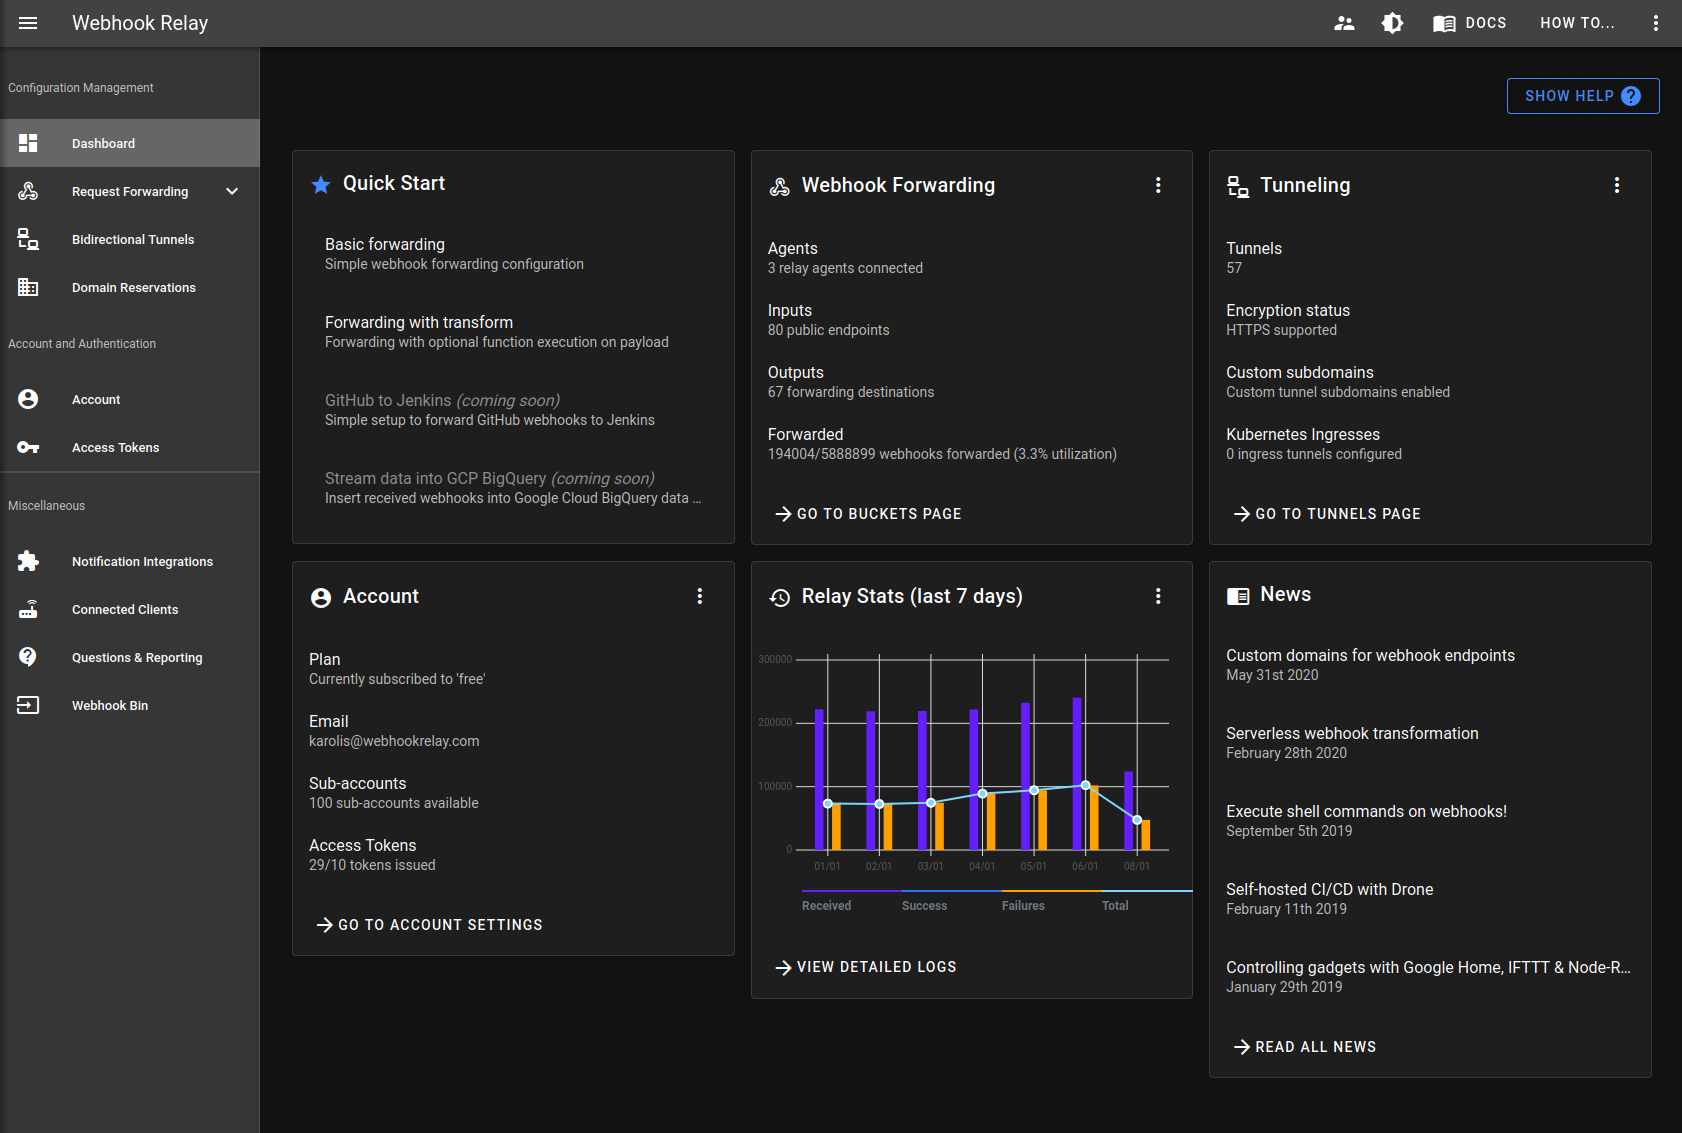 Webhook Relay dashboard